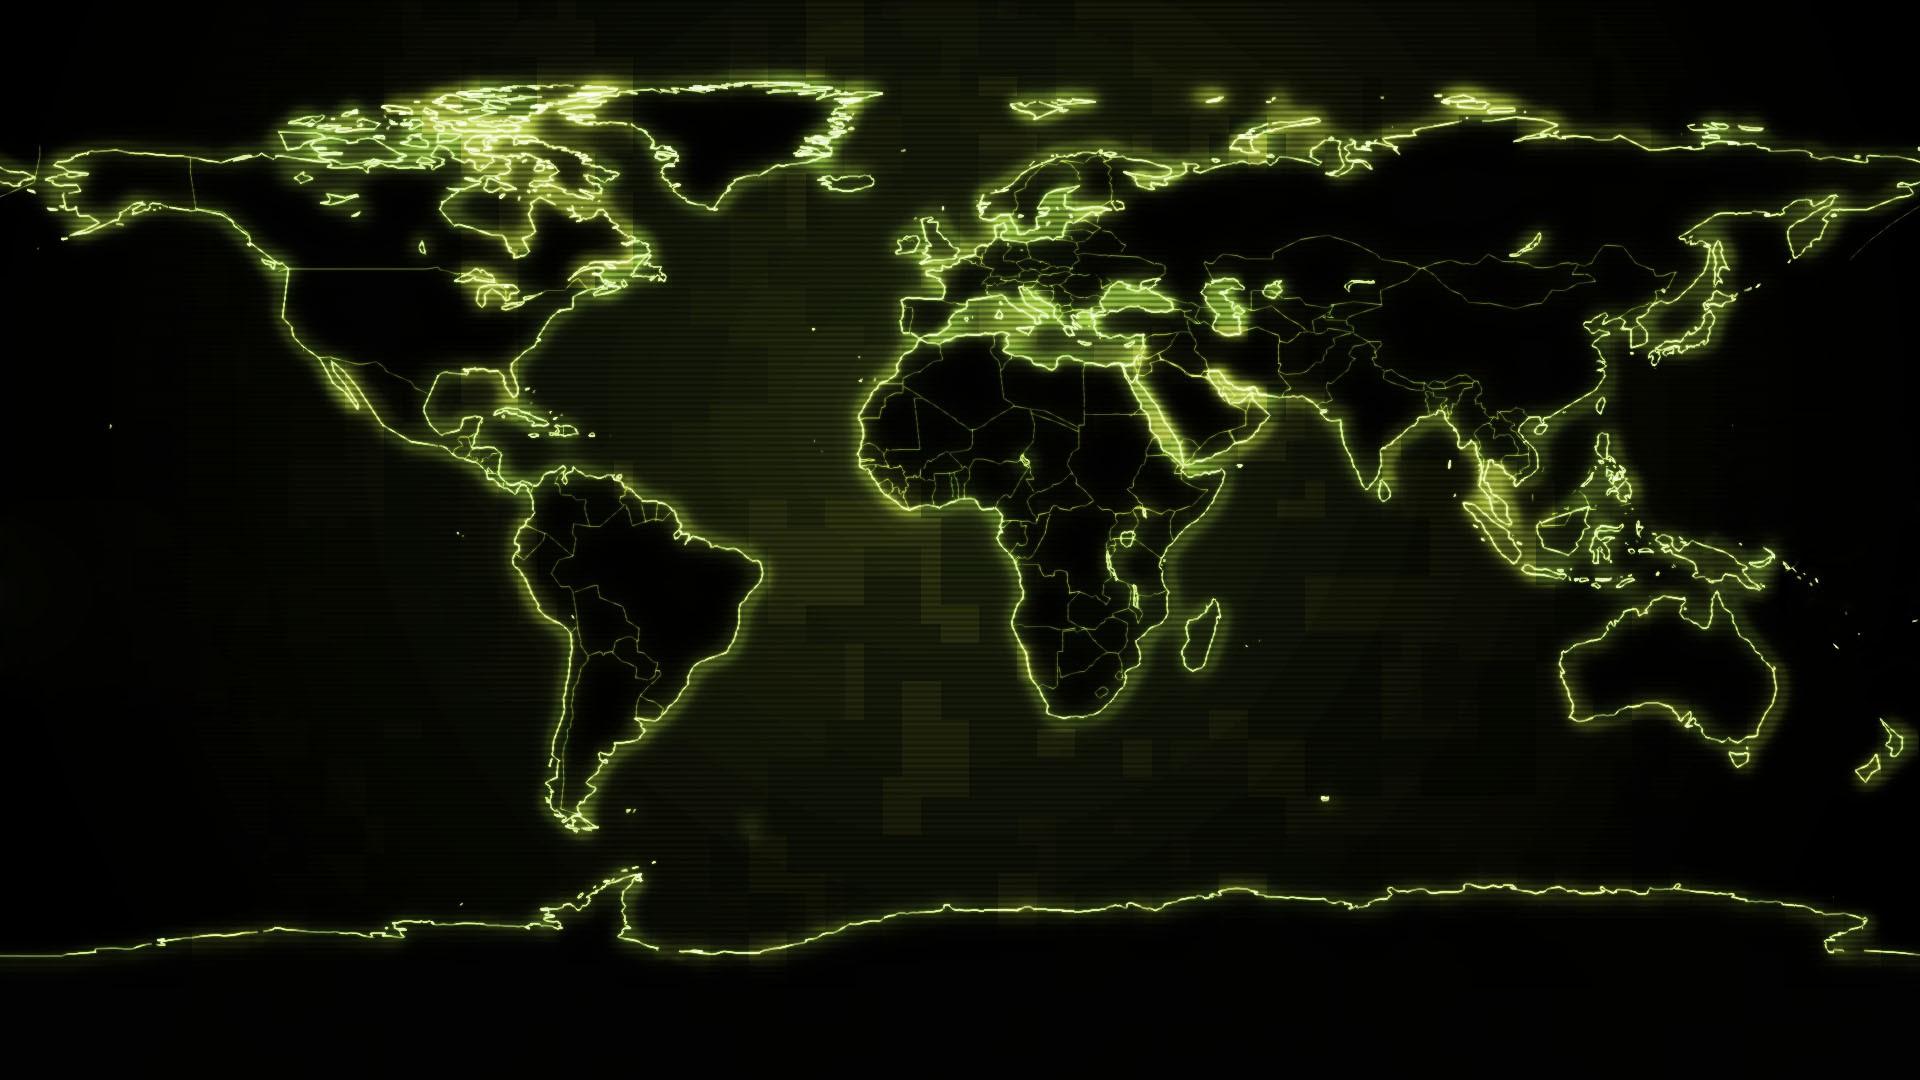 World map wallpaper download free amazing backgrounds for 1920x1080 world map wallpaper 1920x1080 cell phone download world gumiabroncs Choice Image